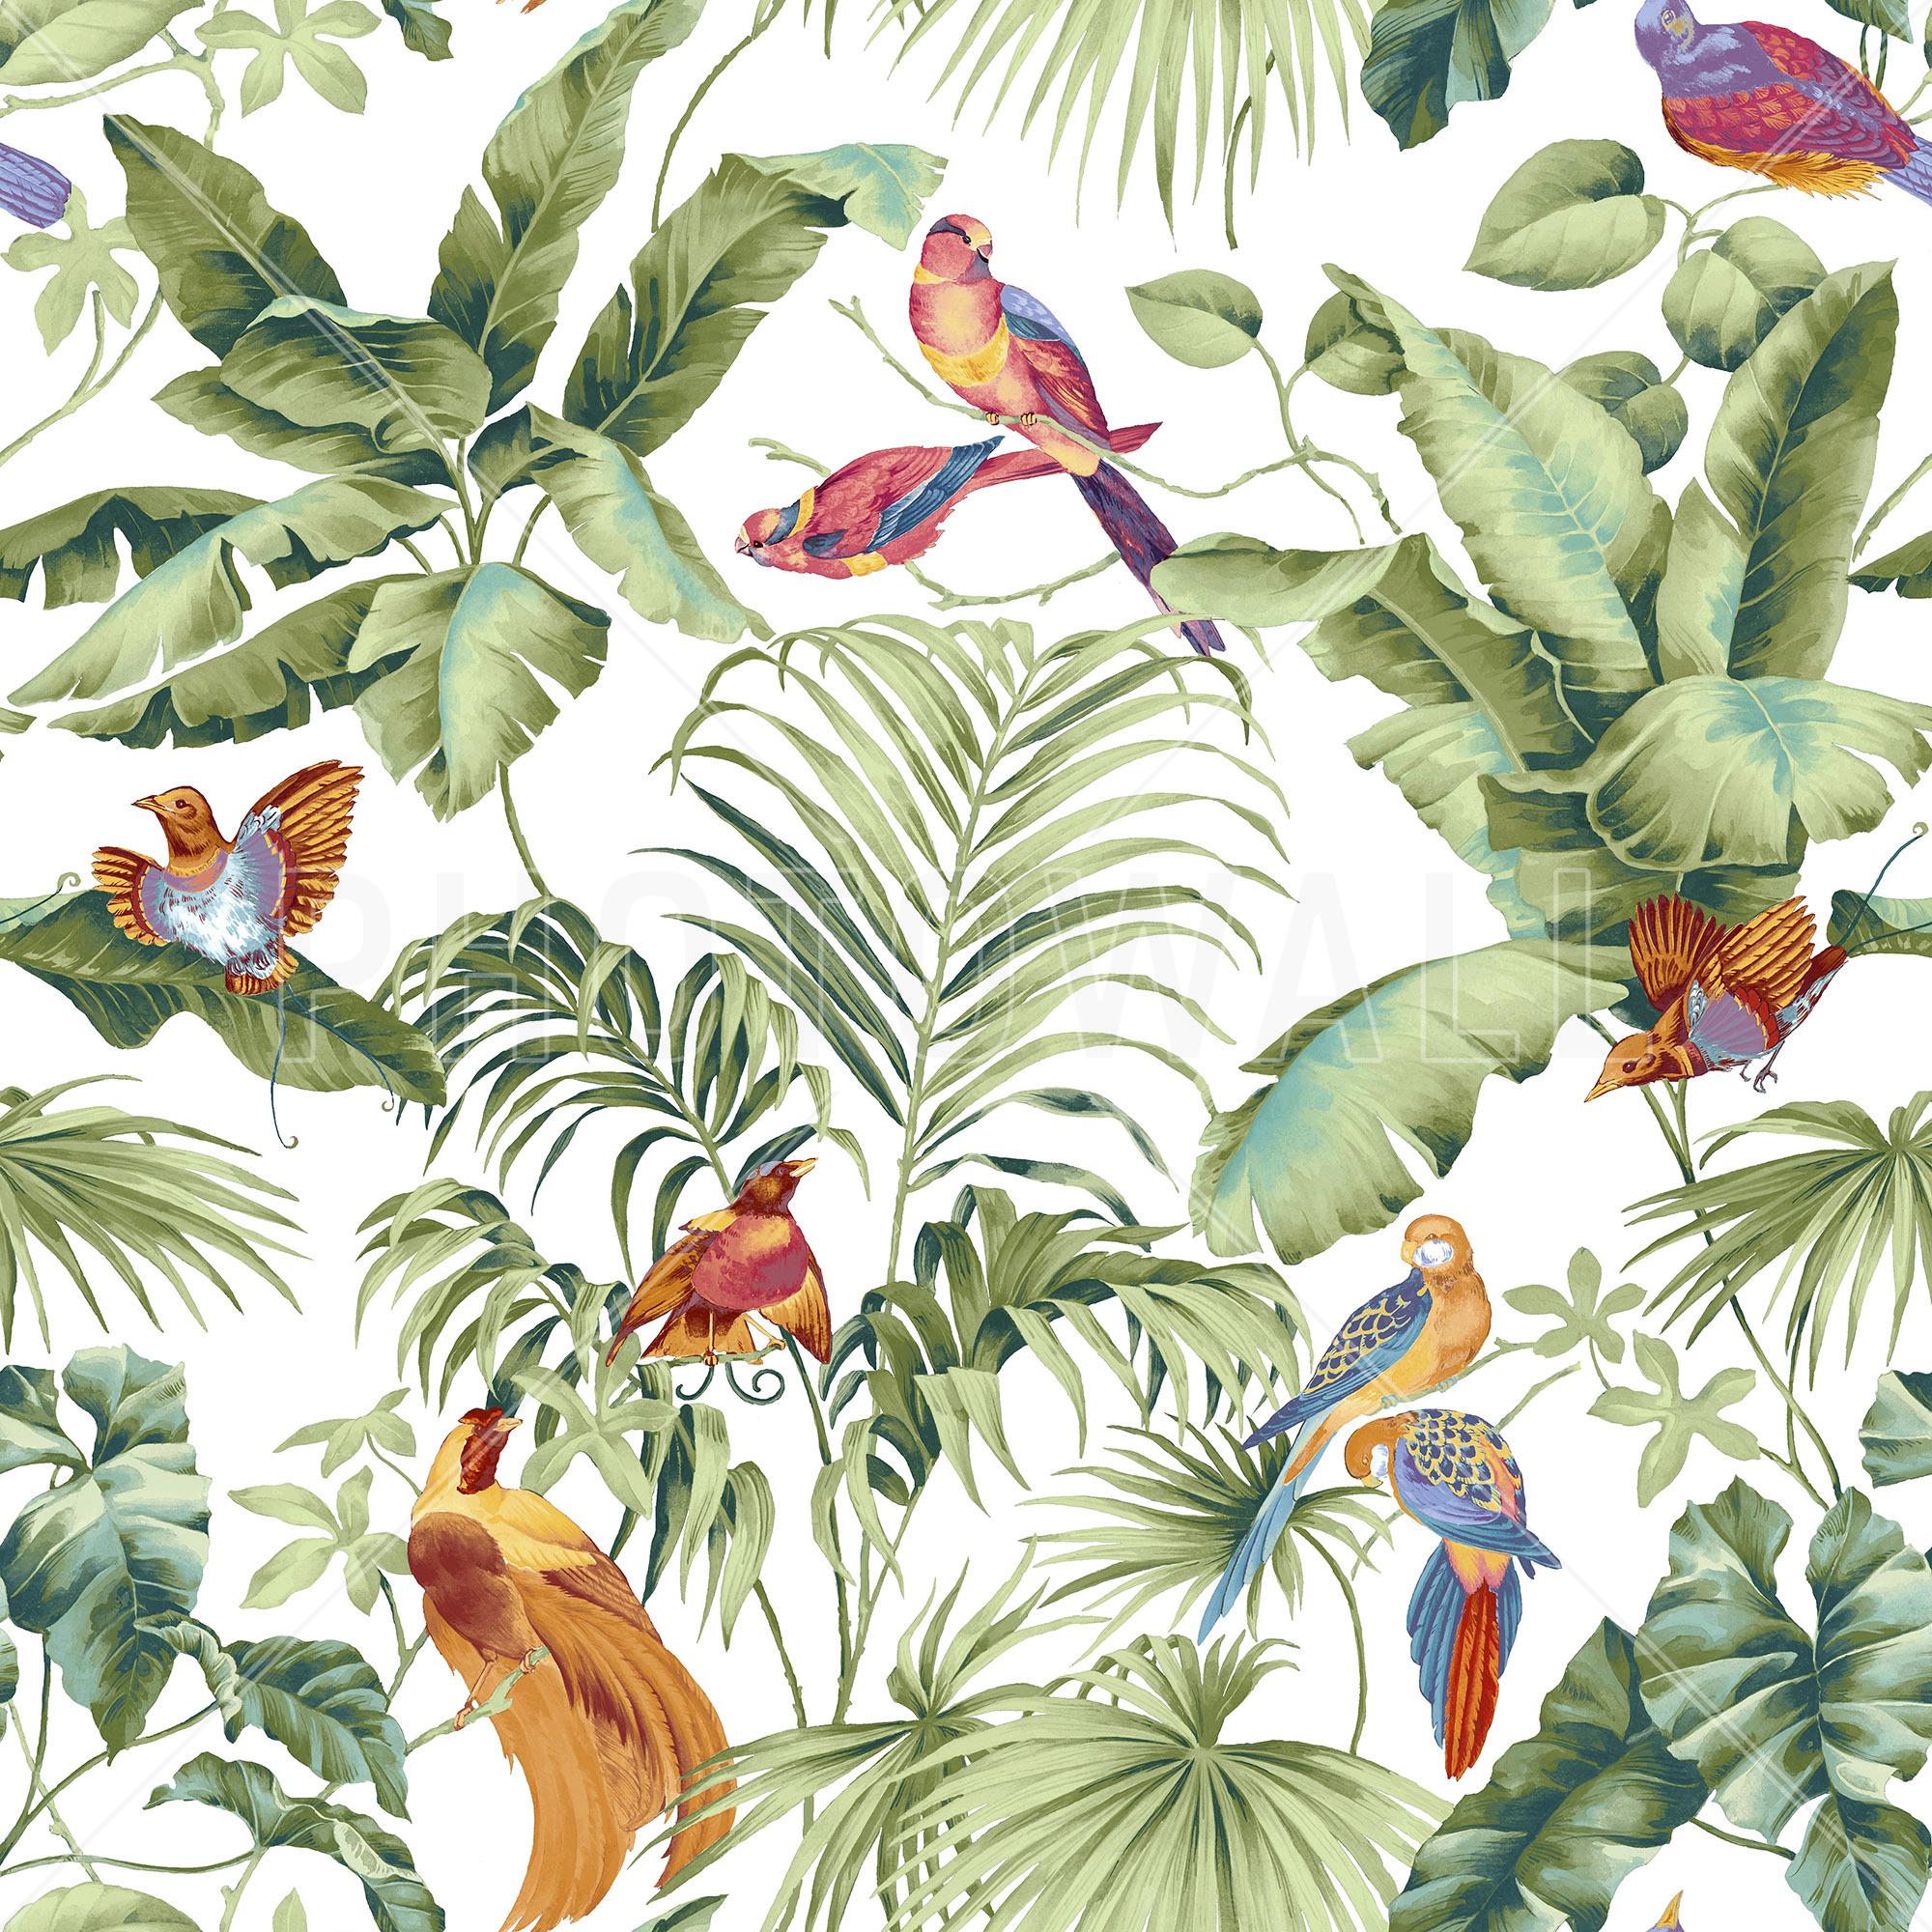 Jungle Canopy 2 Spring  sc 1 st  Photowall.com & Jungle Canopy 2 Spring - Wall Mural u0026 Photo Wallpaper - Photowall